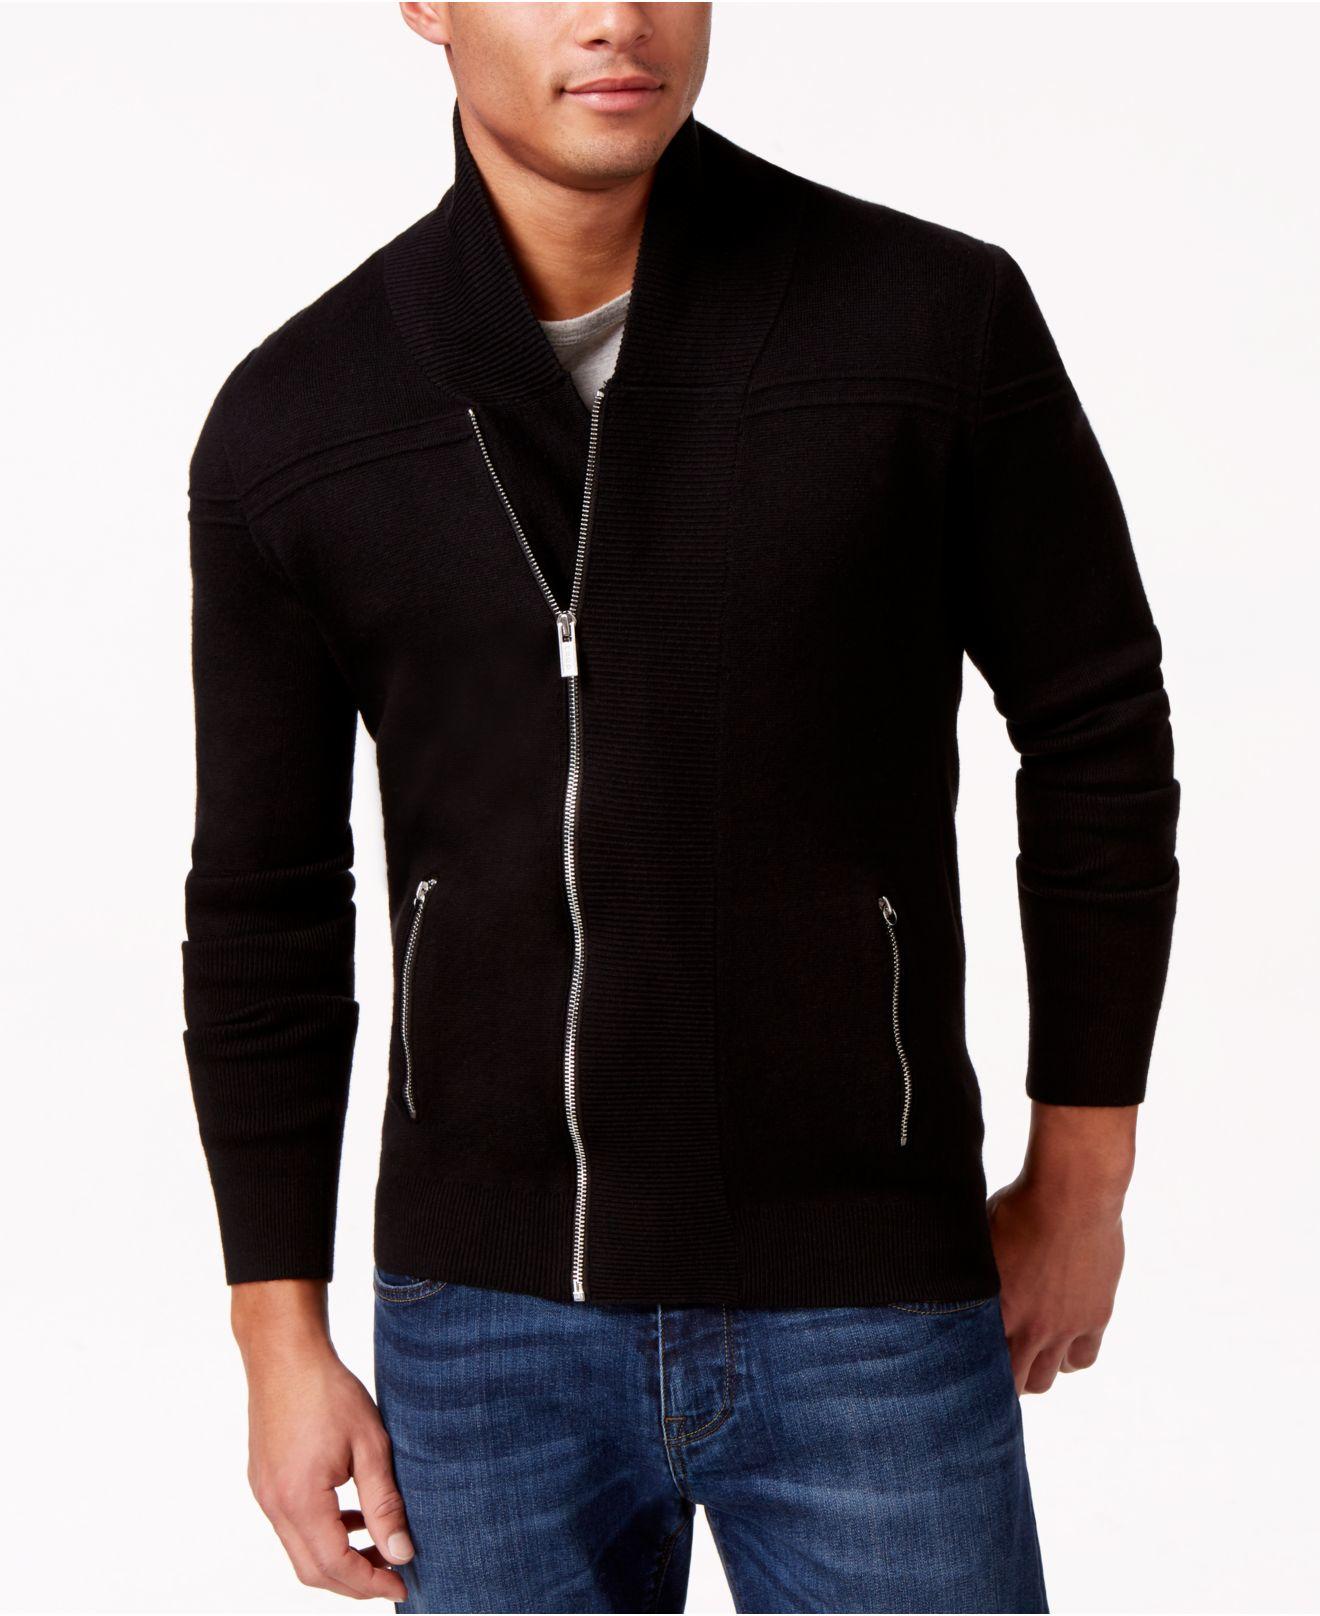 hugo boss black full zip sweater ladies sweater patterns. Black Bedroom Furniture Sets. Home Design Ideas